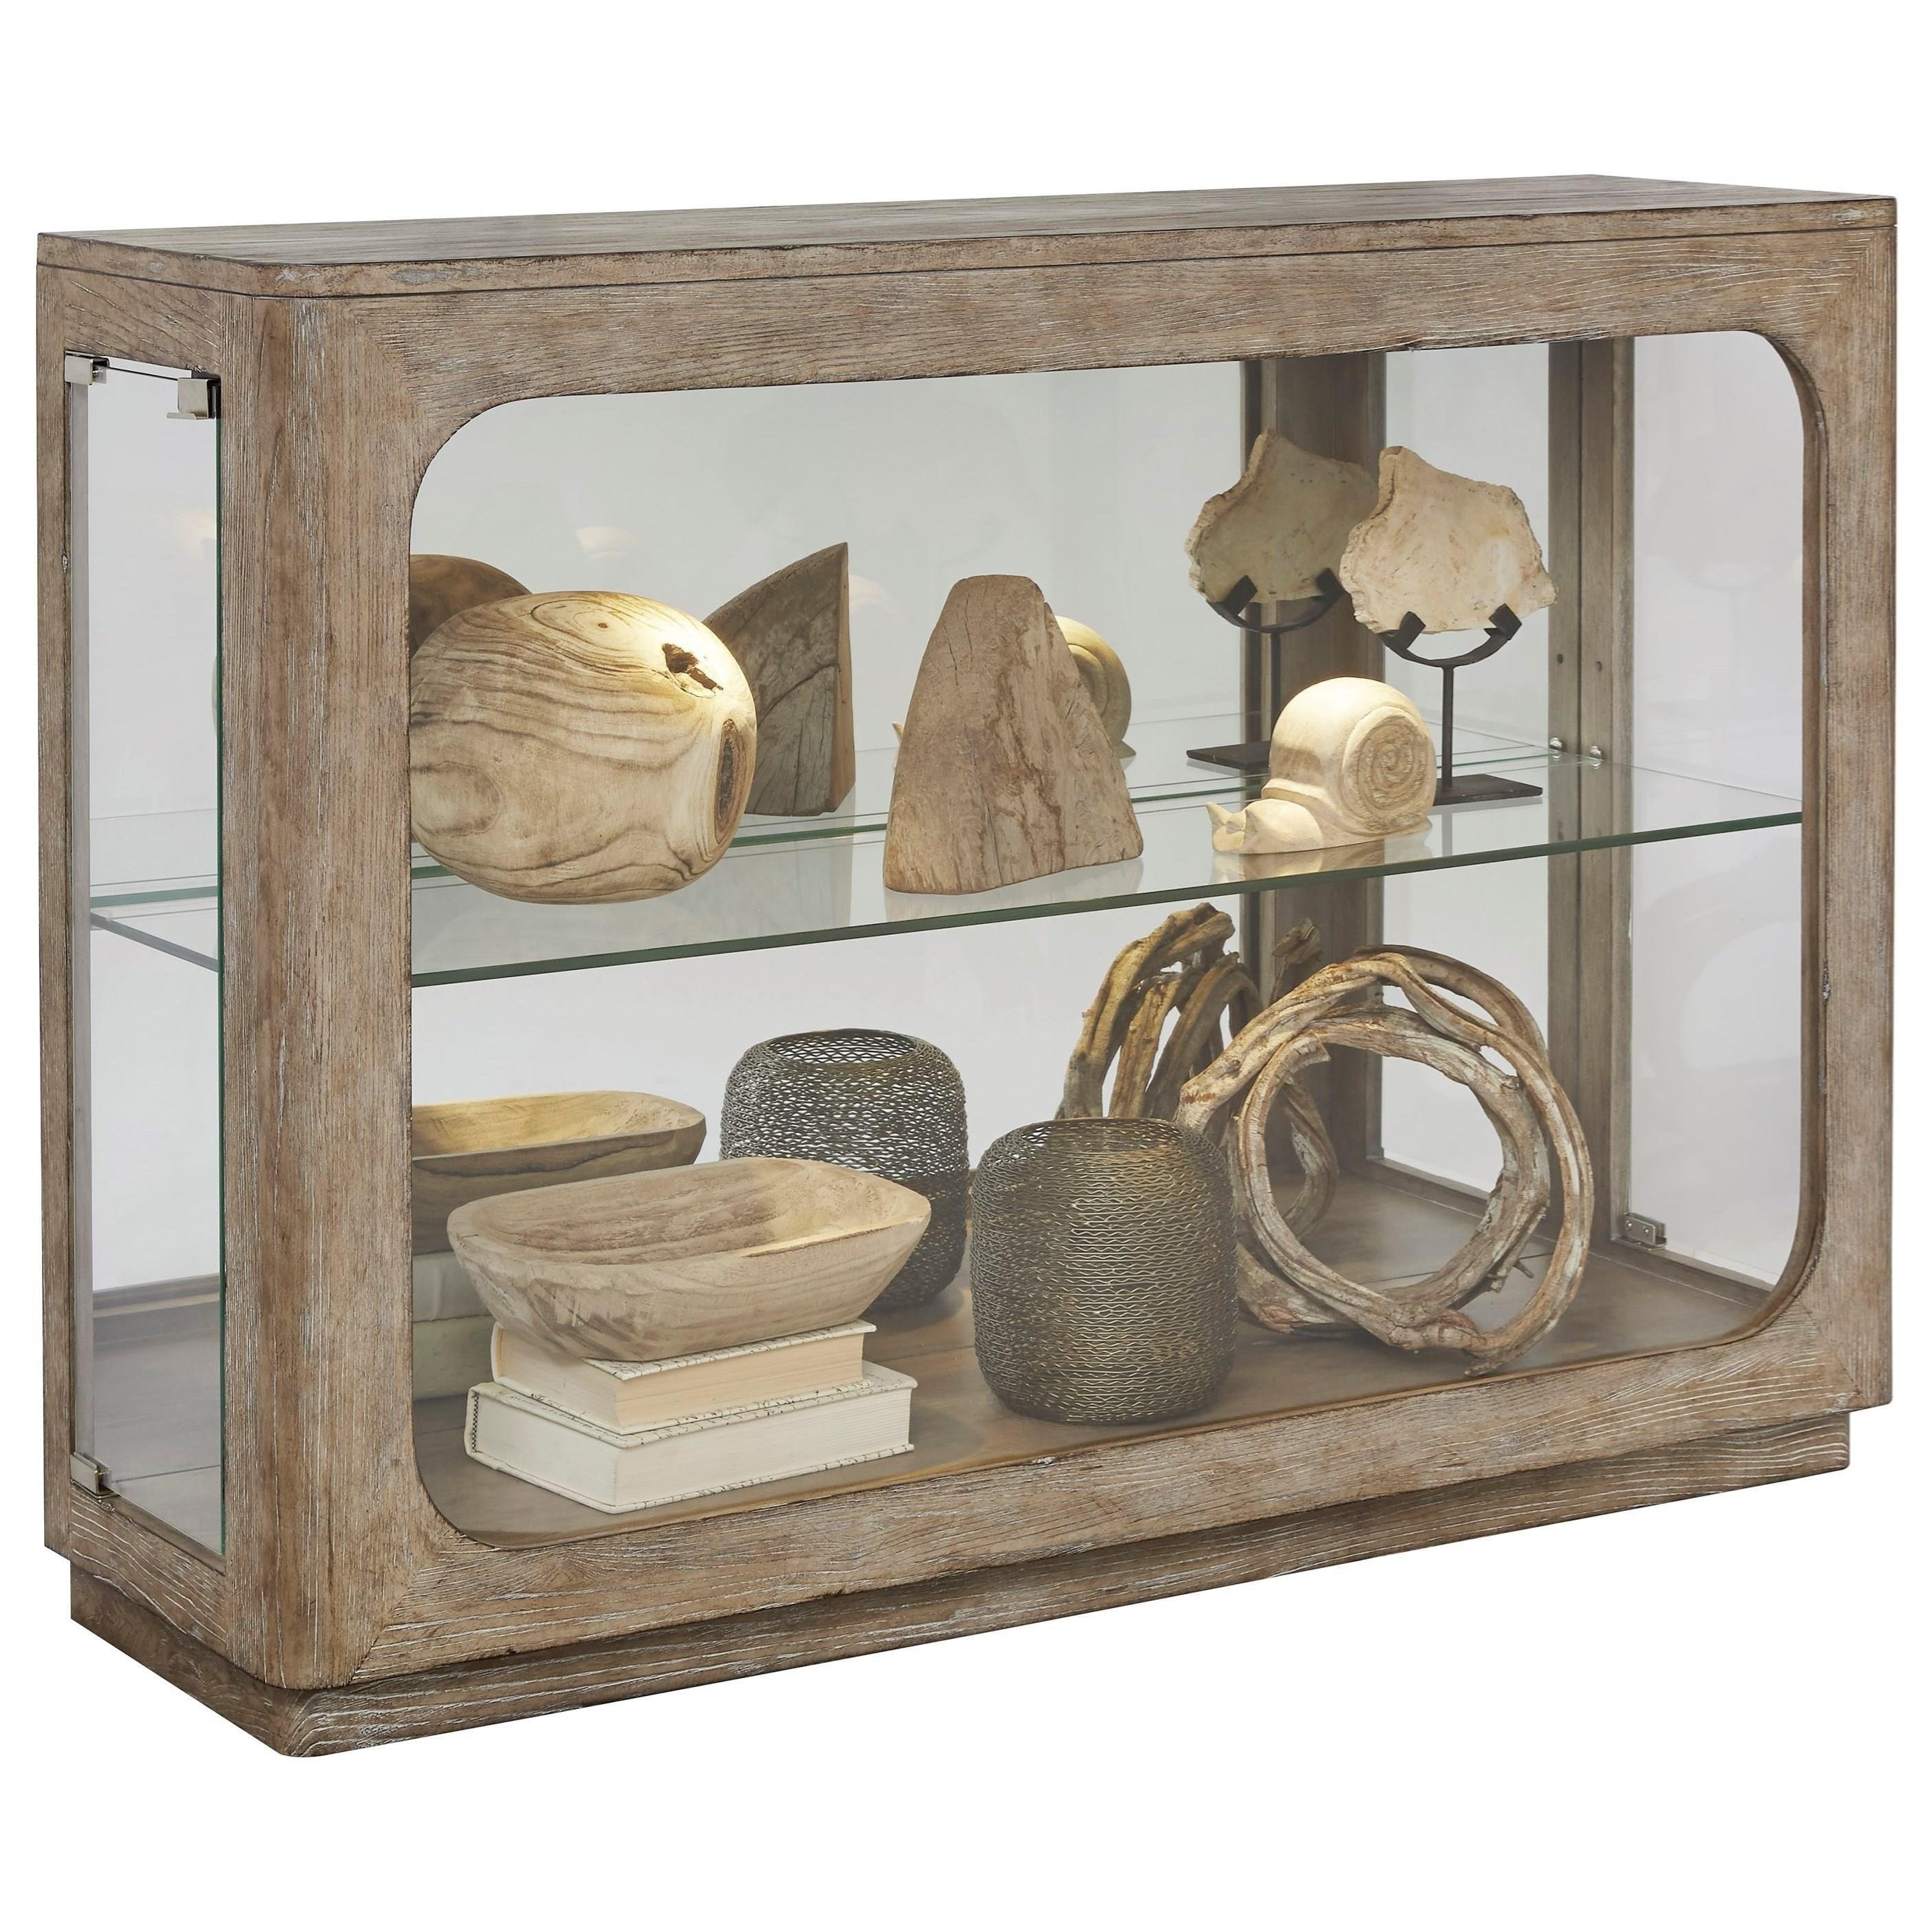 Pulaski Furniture Store: Pulaski Furniture Curios Side Entry Console With Touch